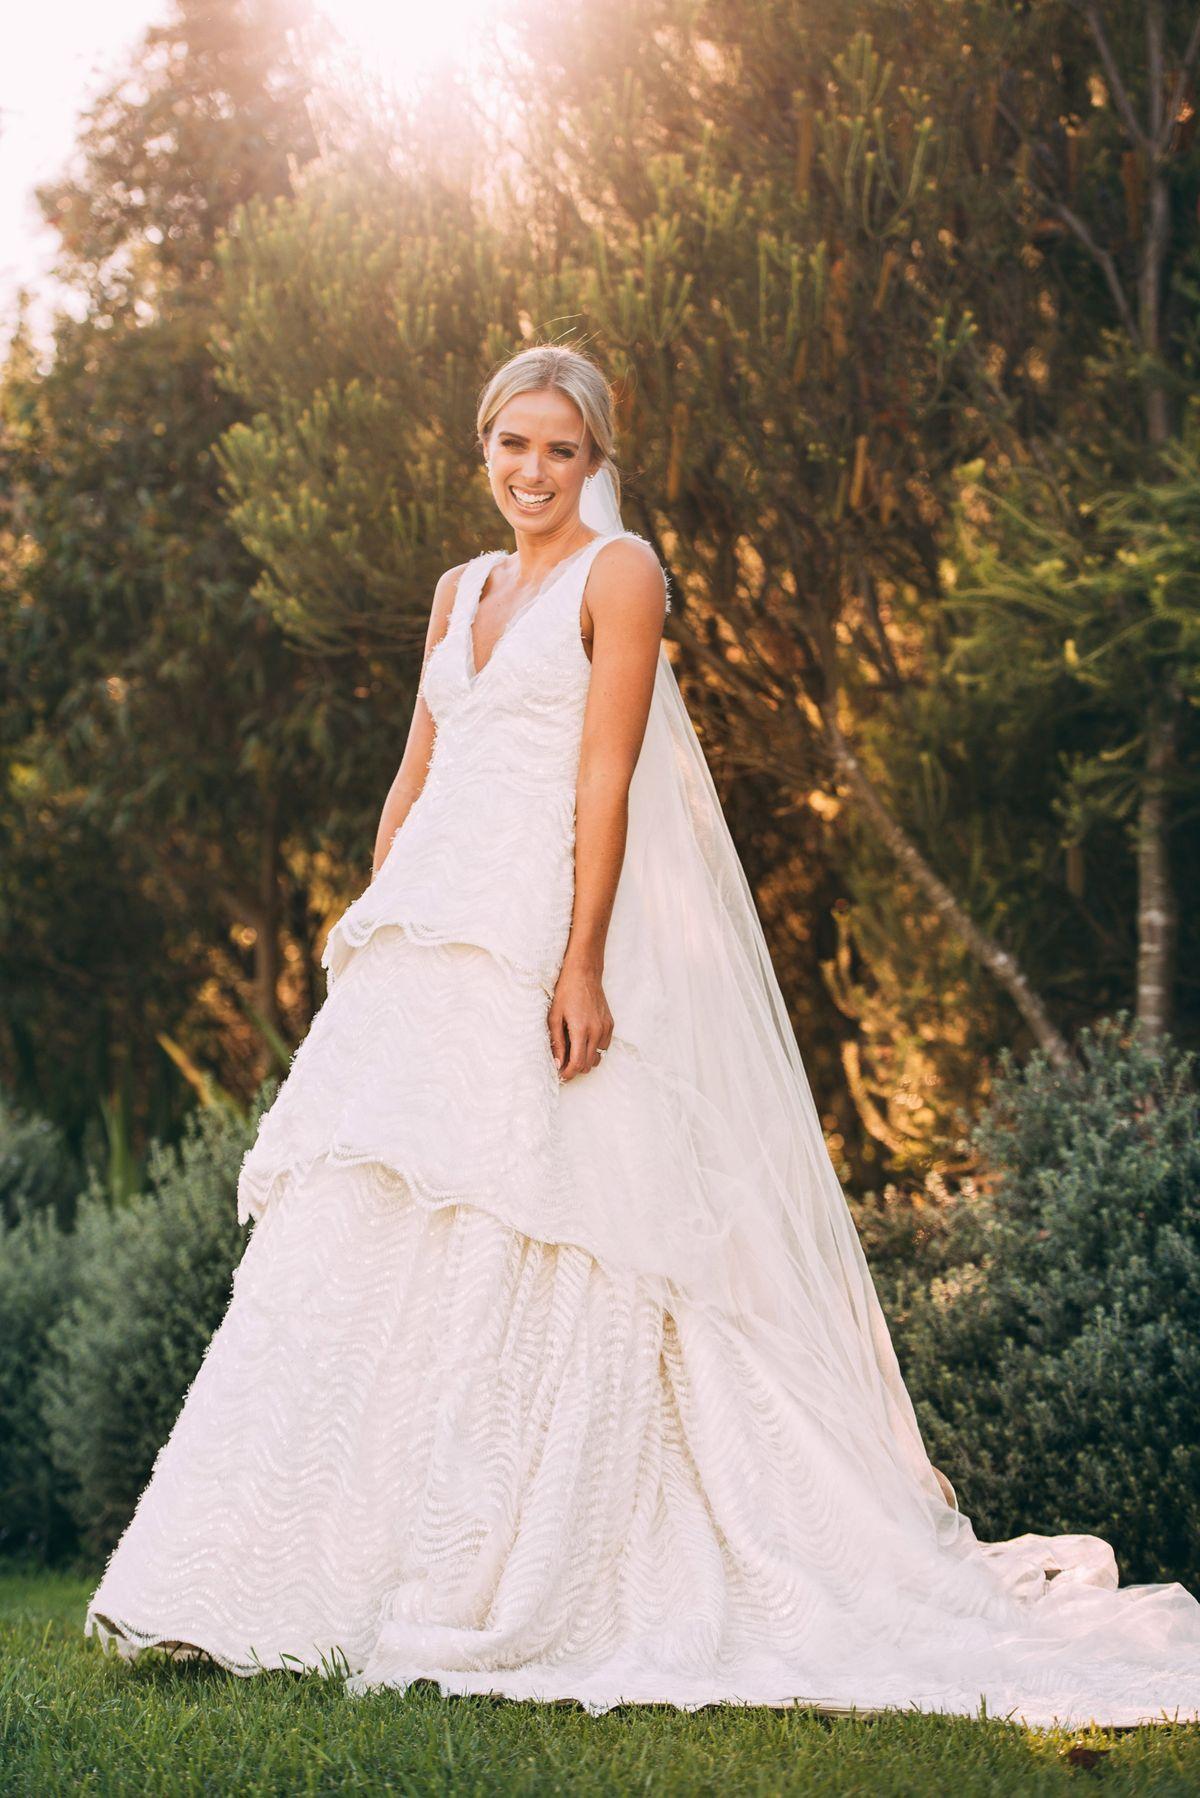 Sylvia Jeffreys's wedding dress designer Rebecca Vallance